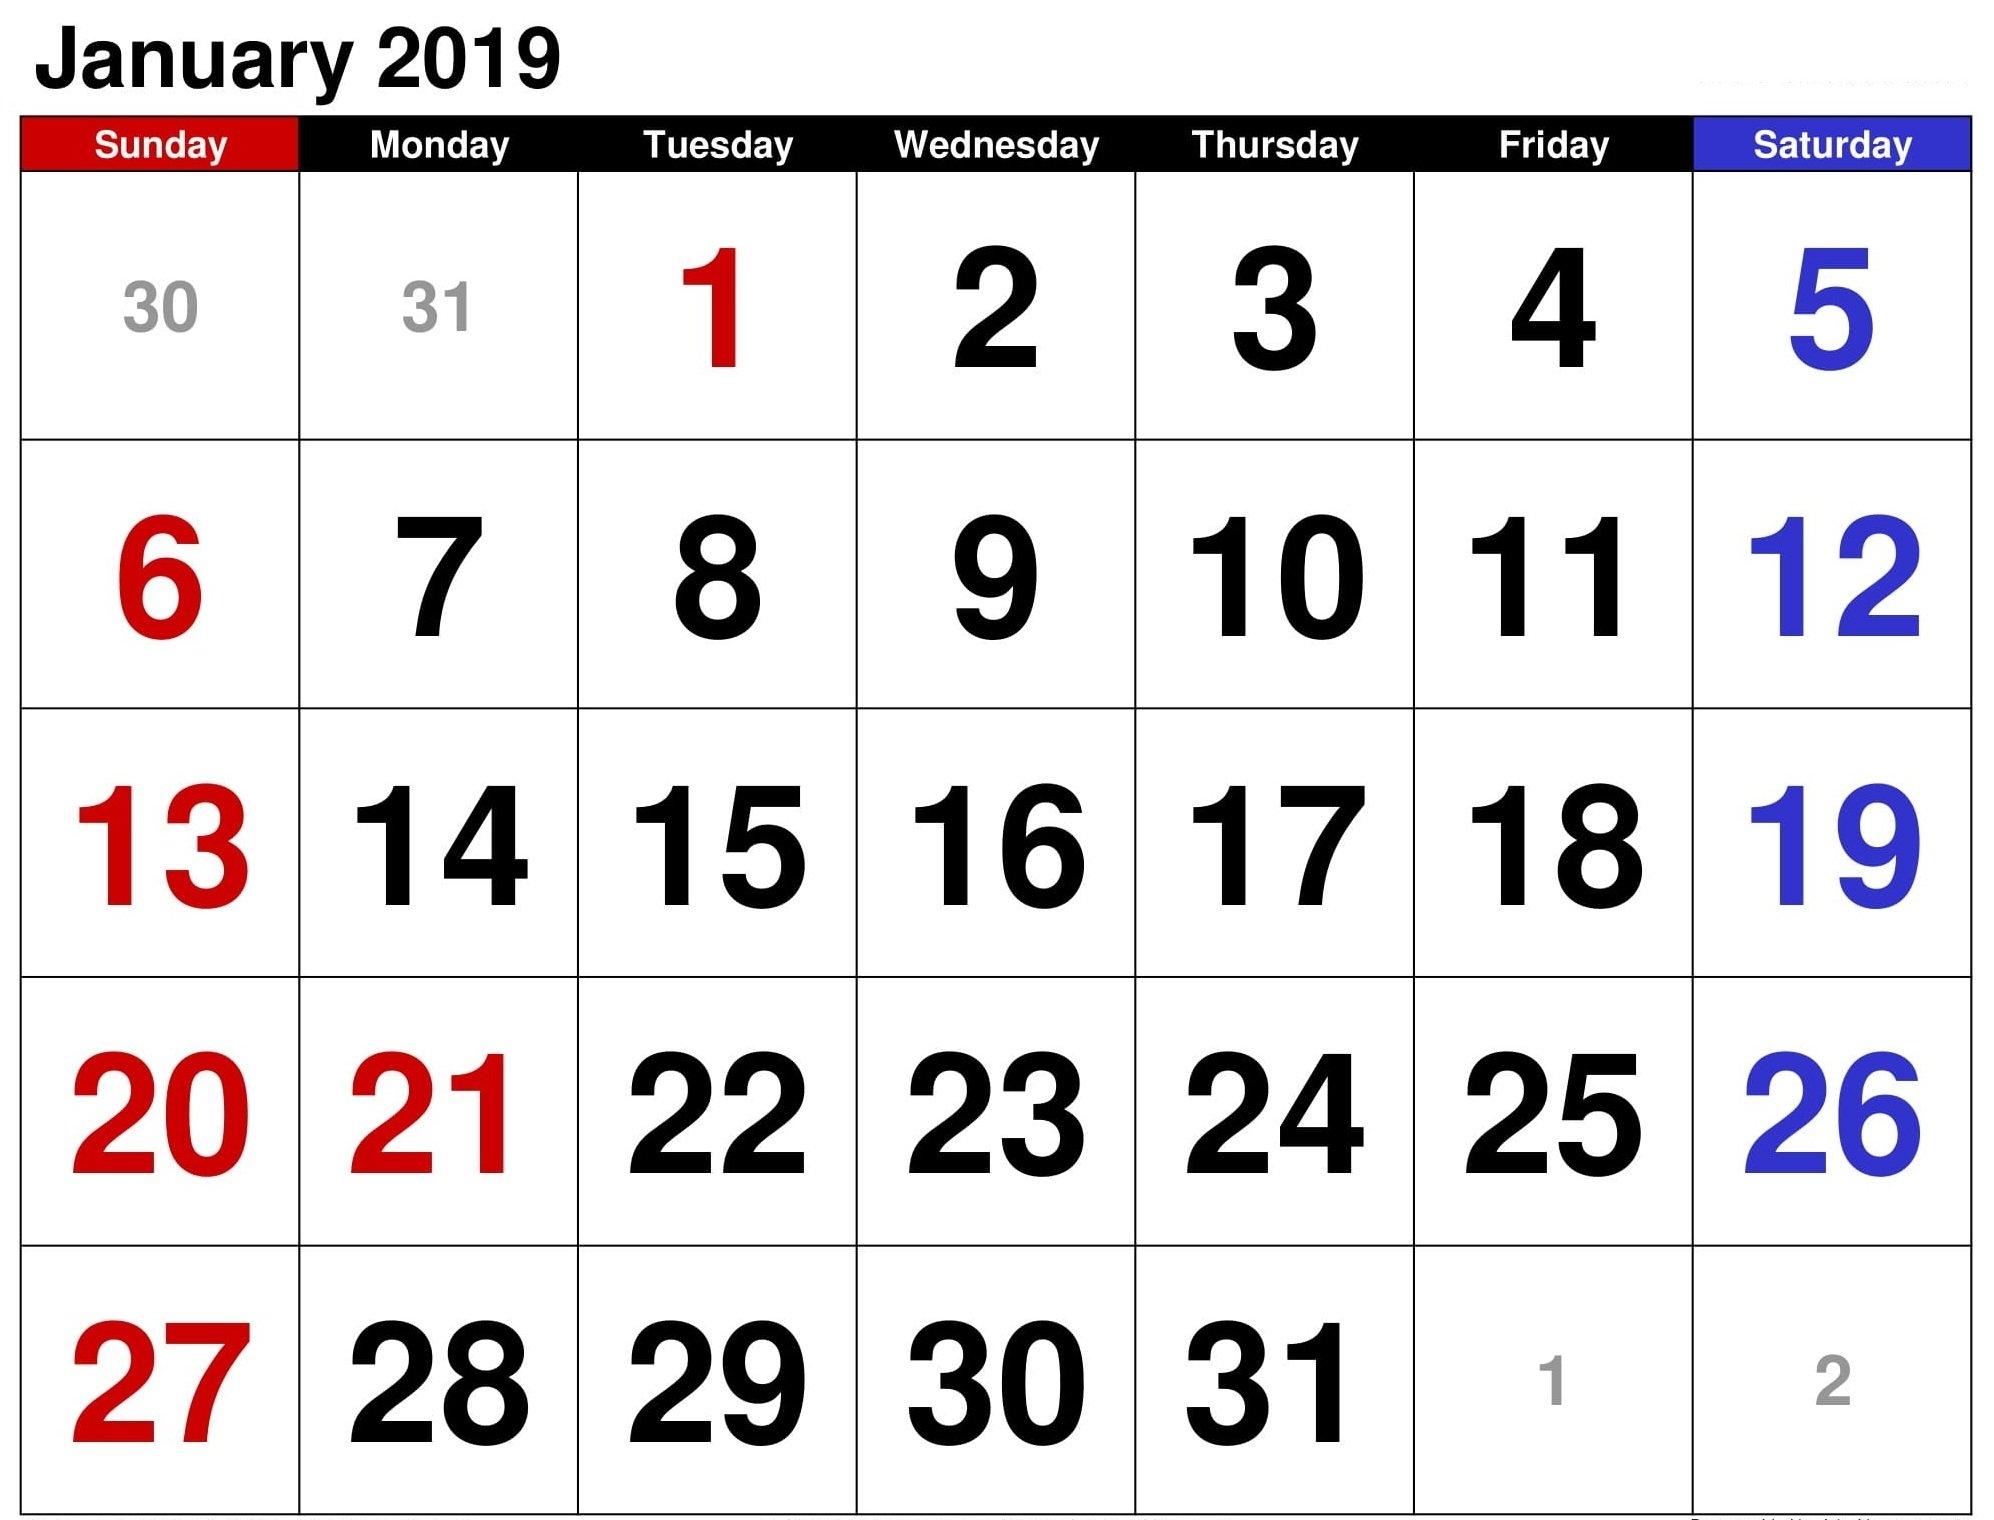 January Bank Holidays 2019 Calendar – Free Calendar Templates Calendar 2019 Bank Holidays